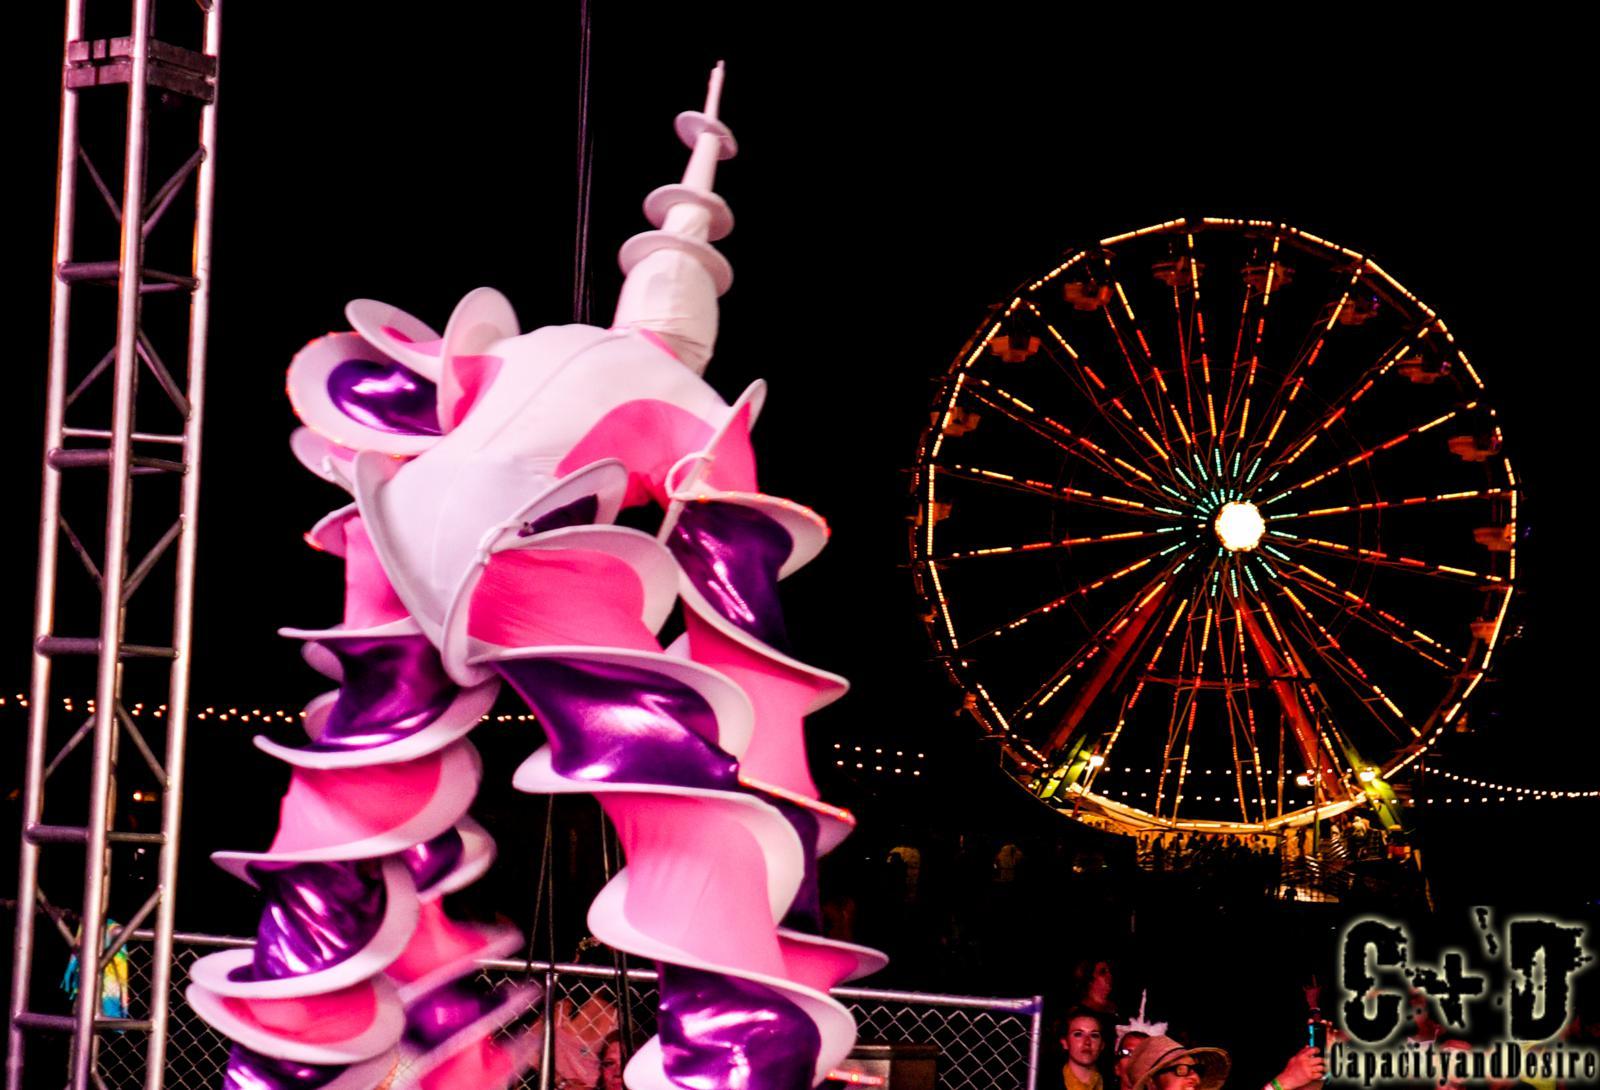 Slinky Wheel-1_1600x1090